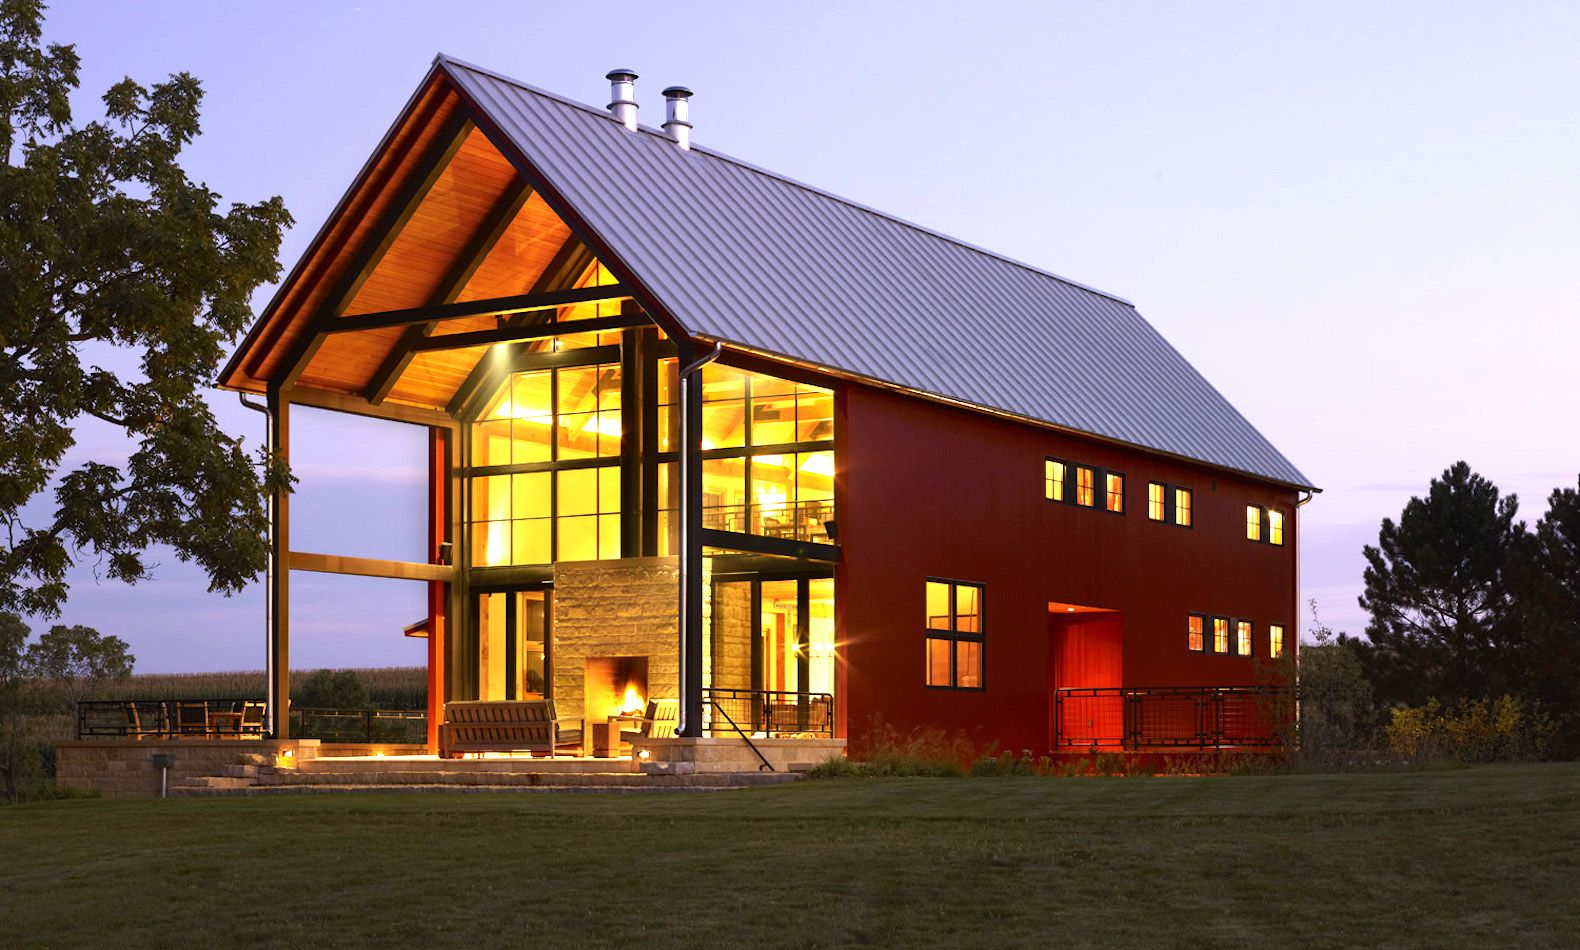 old shabby barn is reborn as a stunning, near net-zero modern home